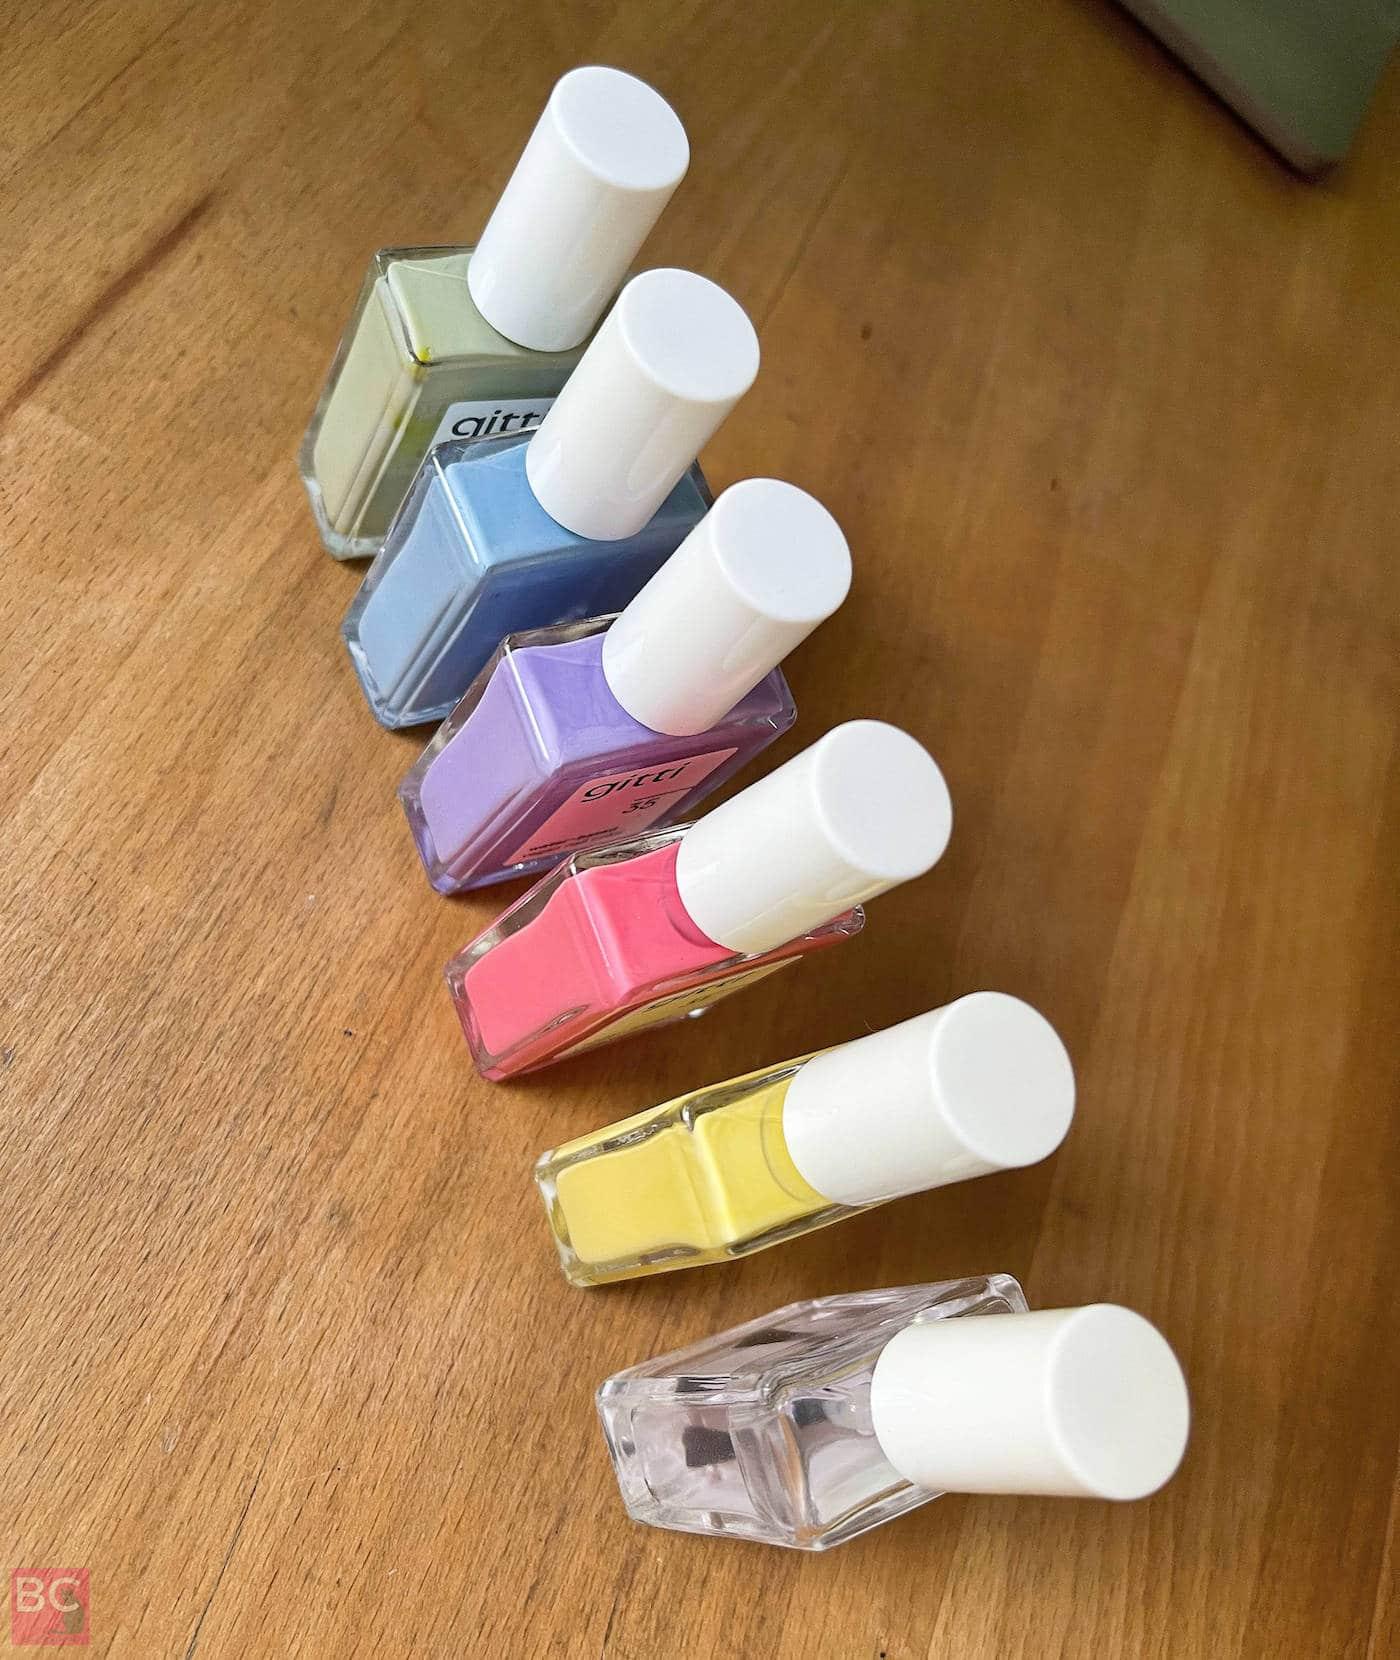 Gitti Nagellack Rainbow Reihenfolge Farben Regenbogen bunte Nägel lackieren